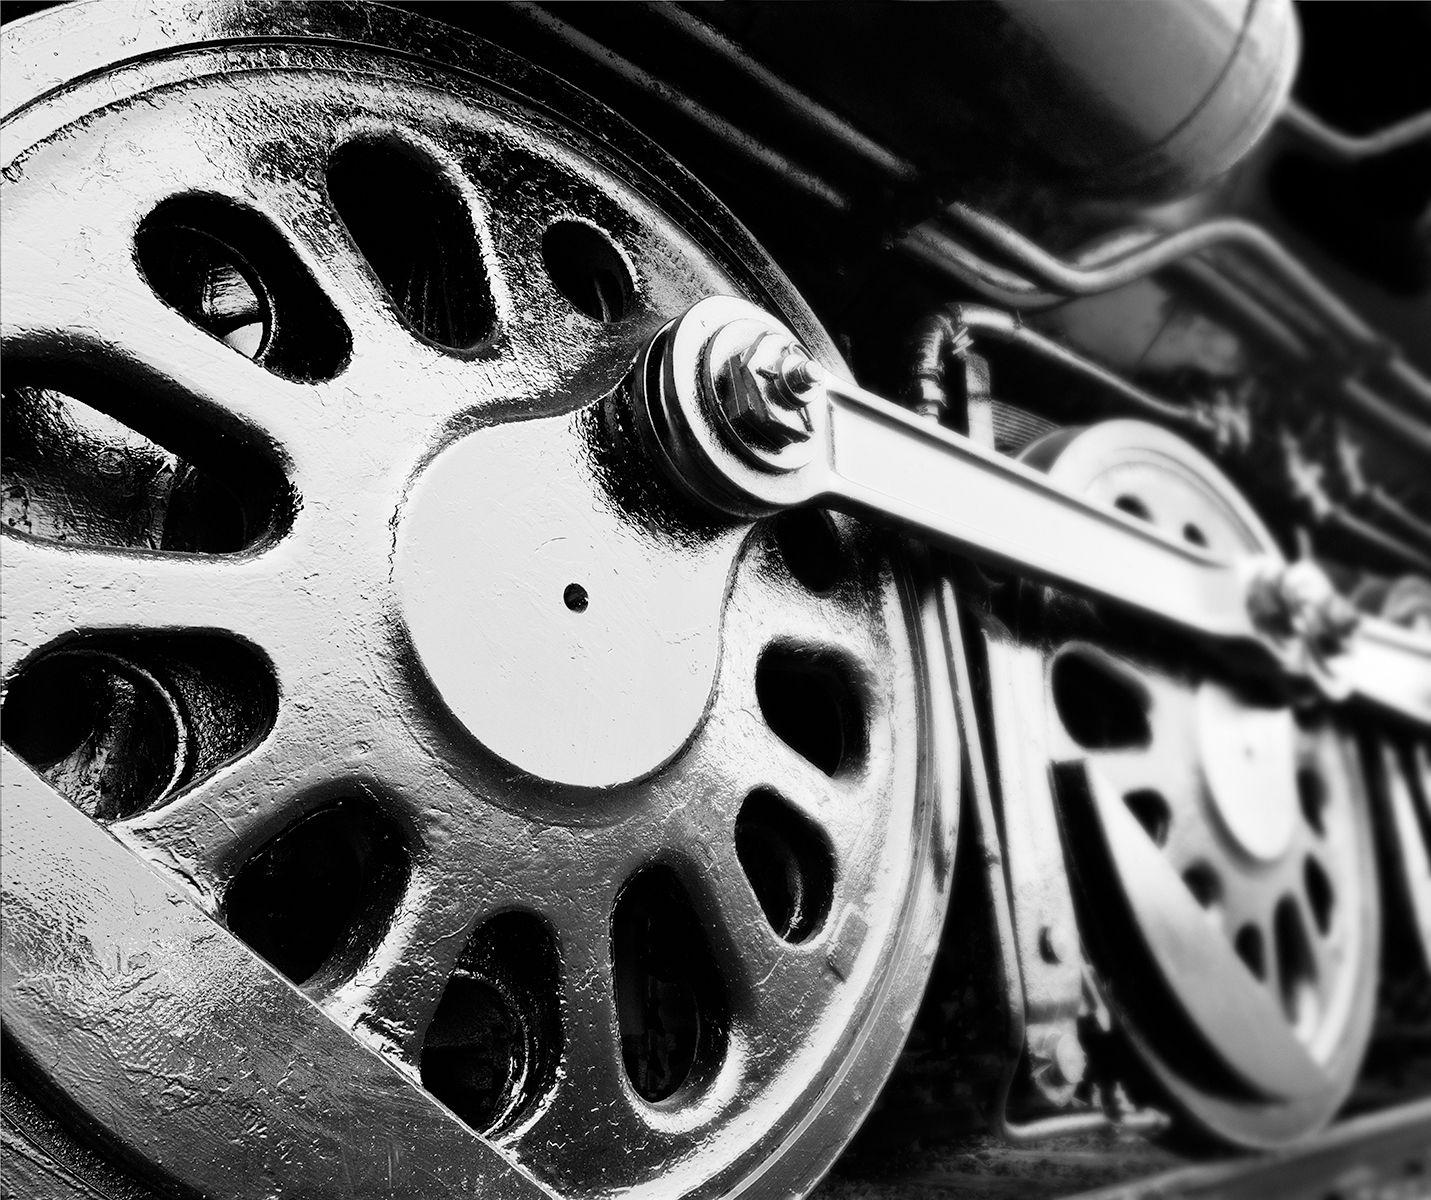 Drive Wheels LVT copy.jpg